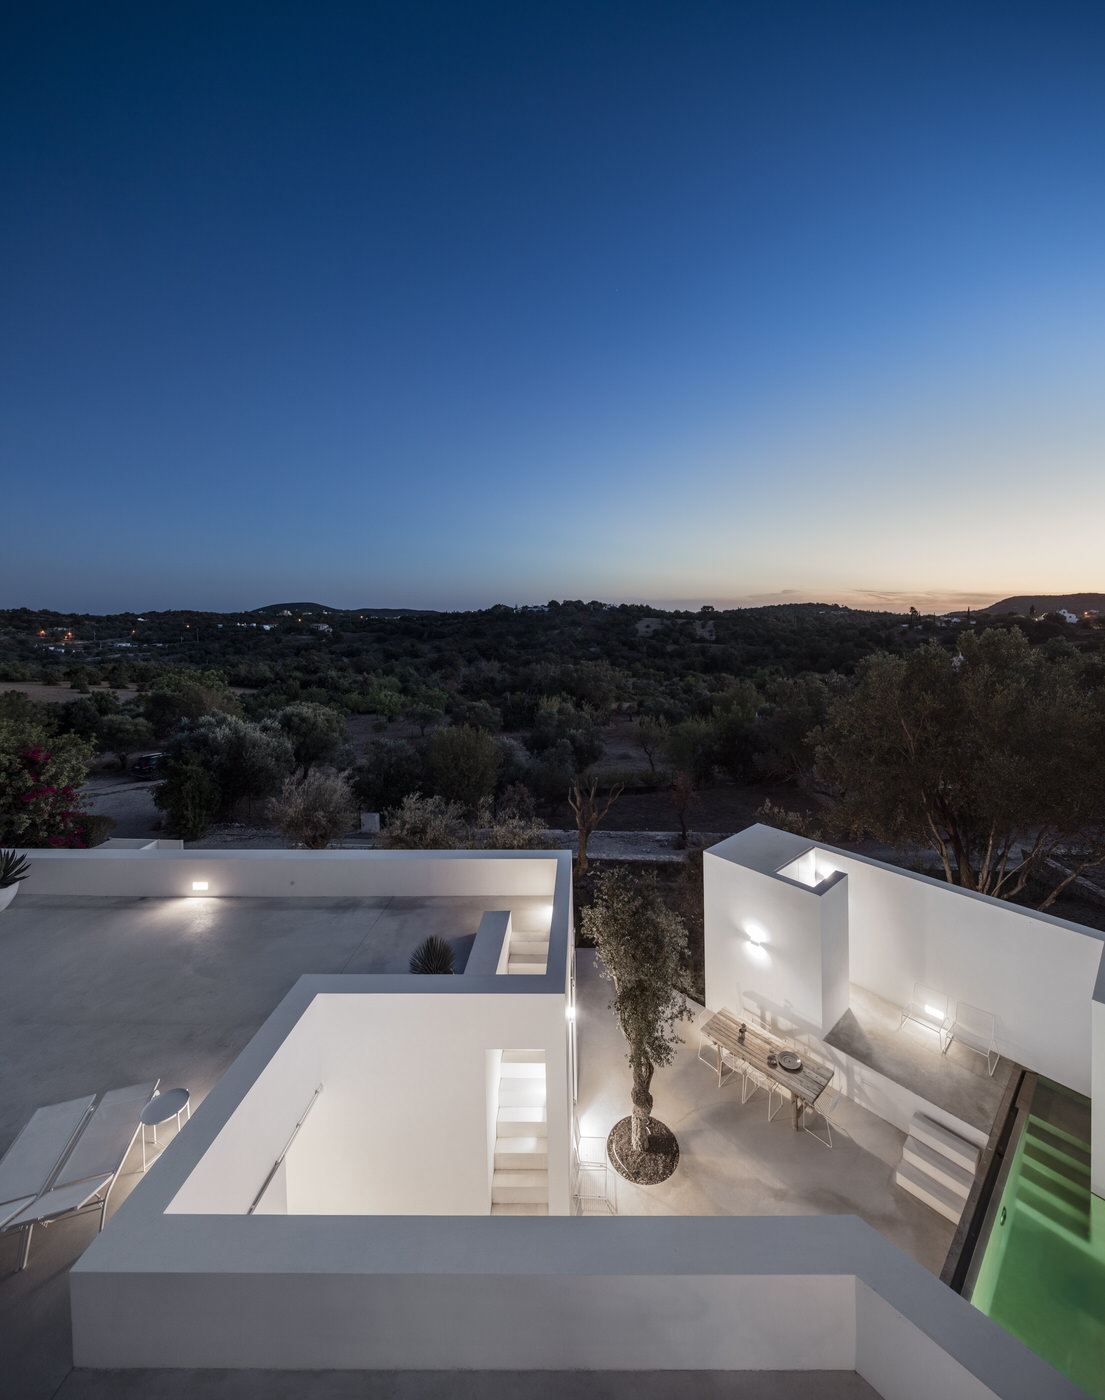 Zalig-Algarve-Casa-Luum-148-1_1